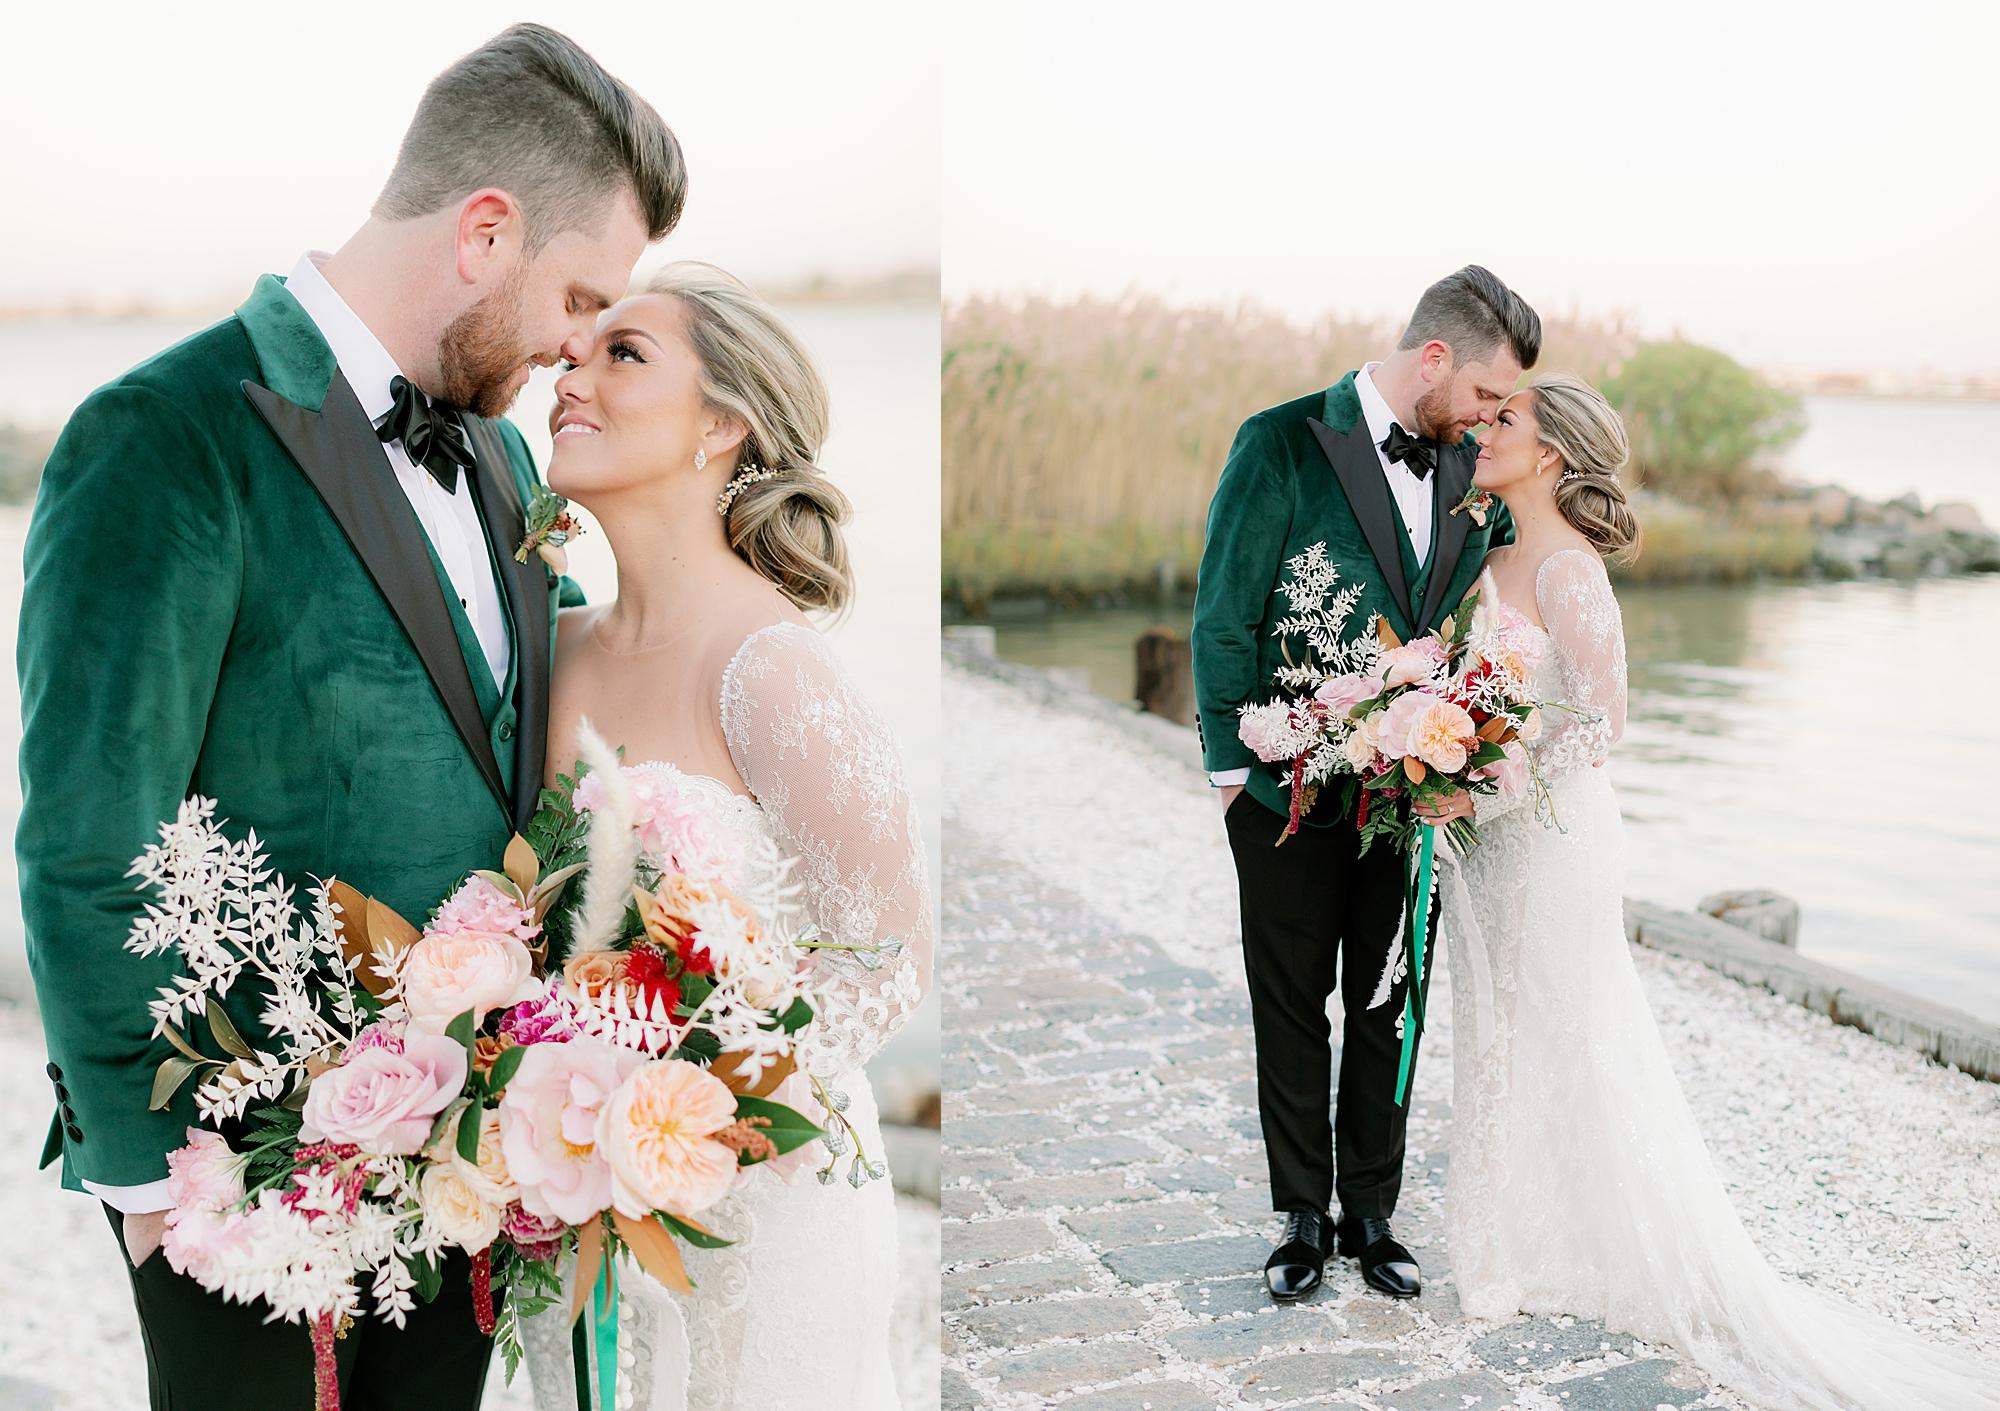 Bonnet Island Estate Film Wedding Photography by Magdalena Studios 0060